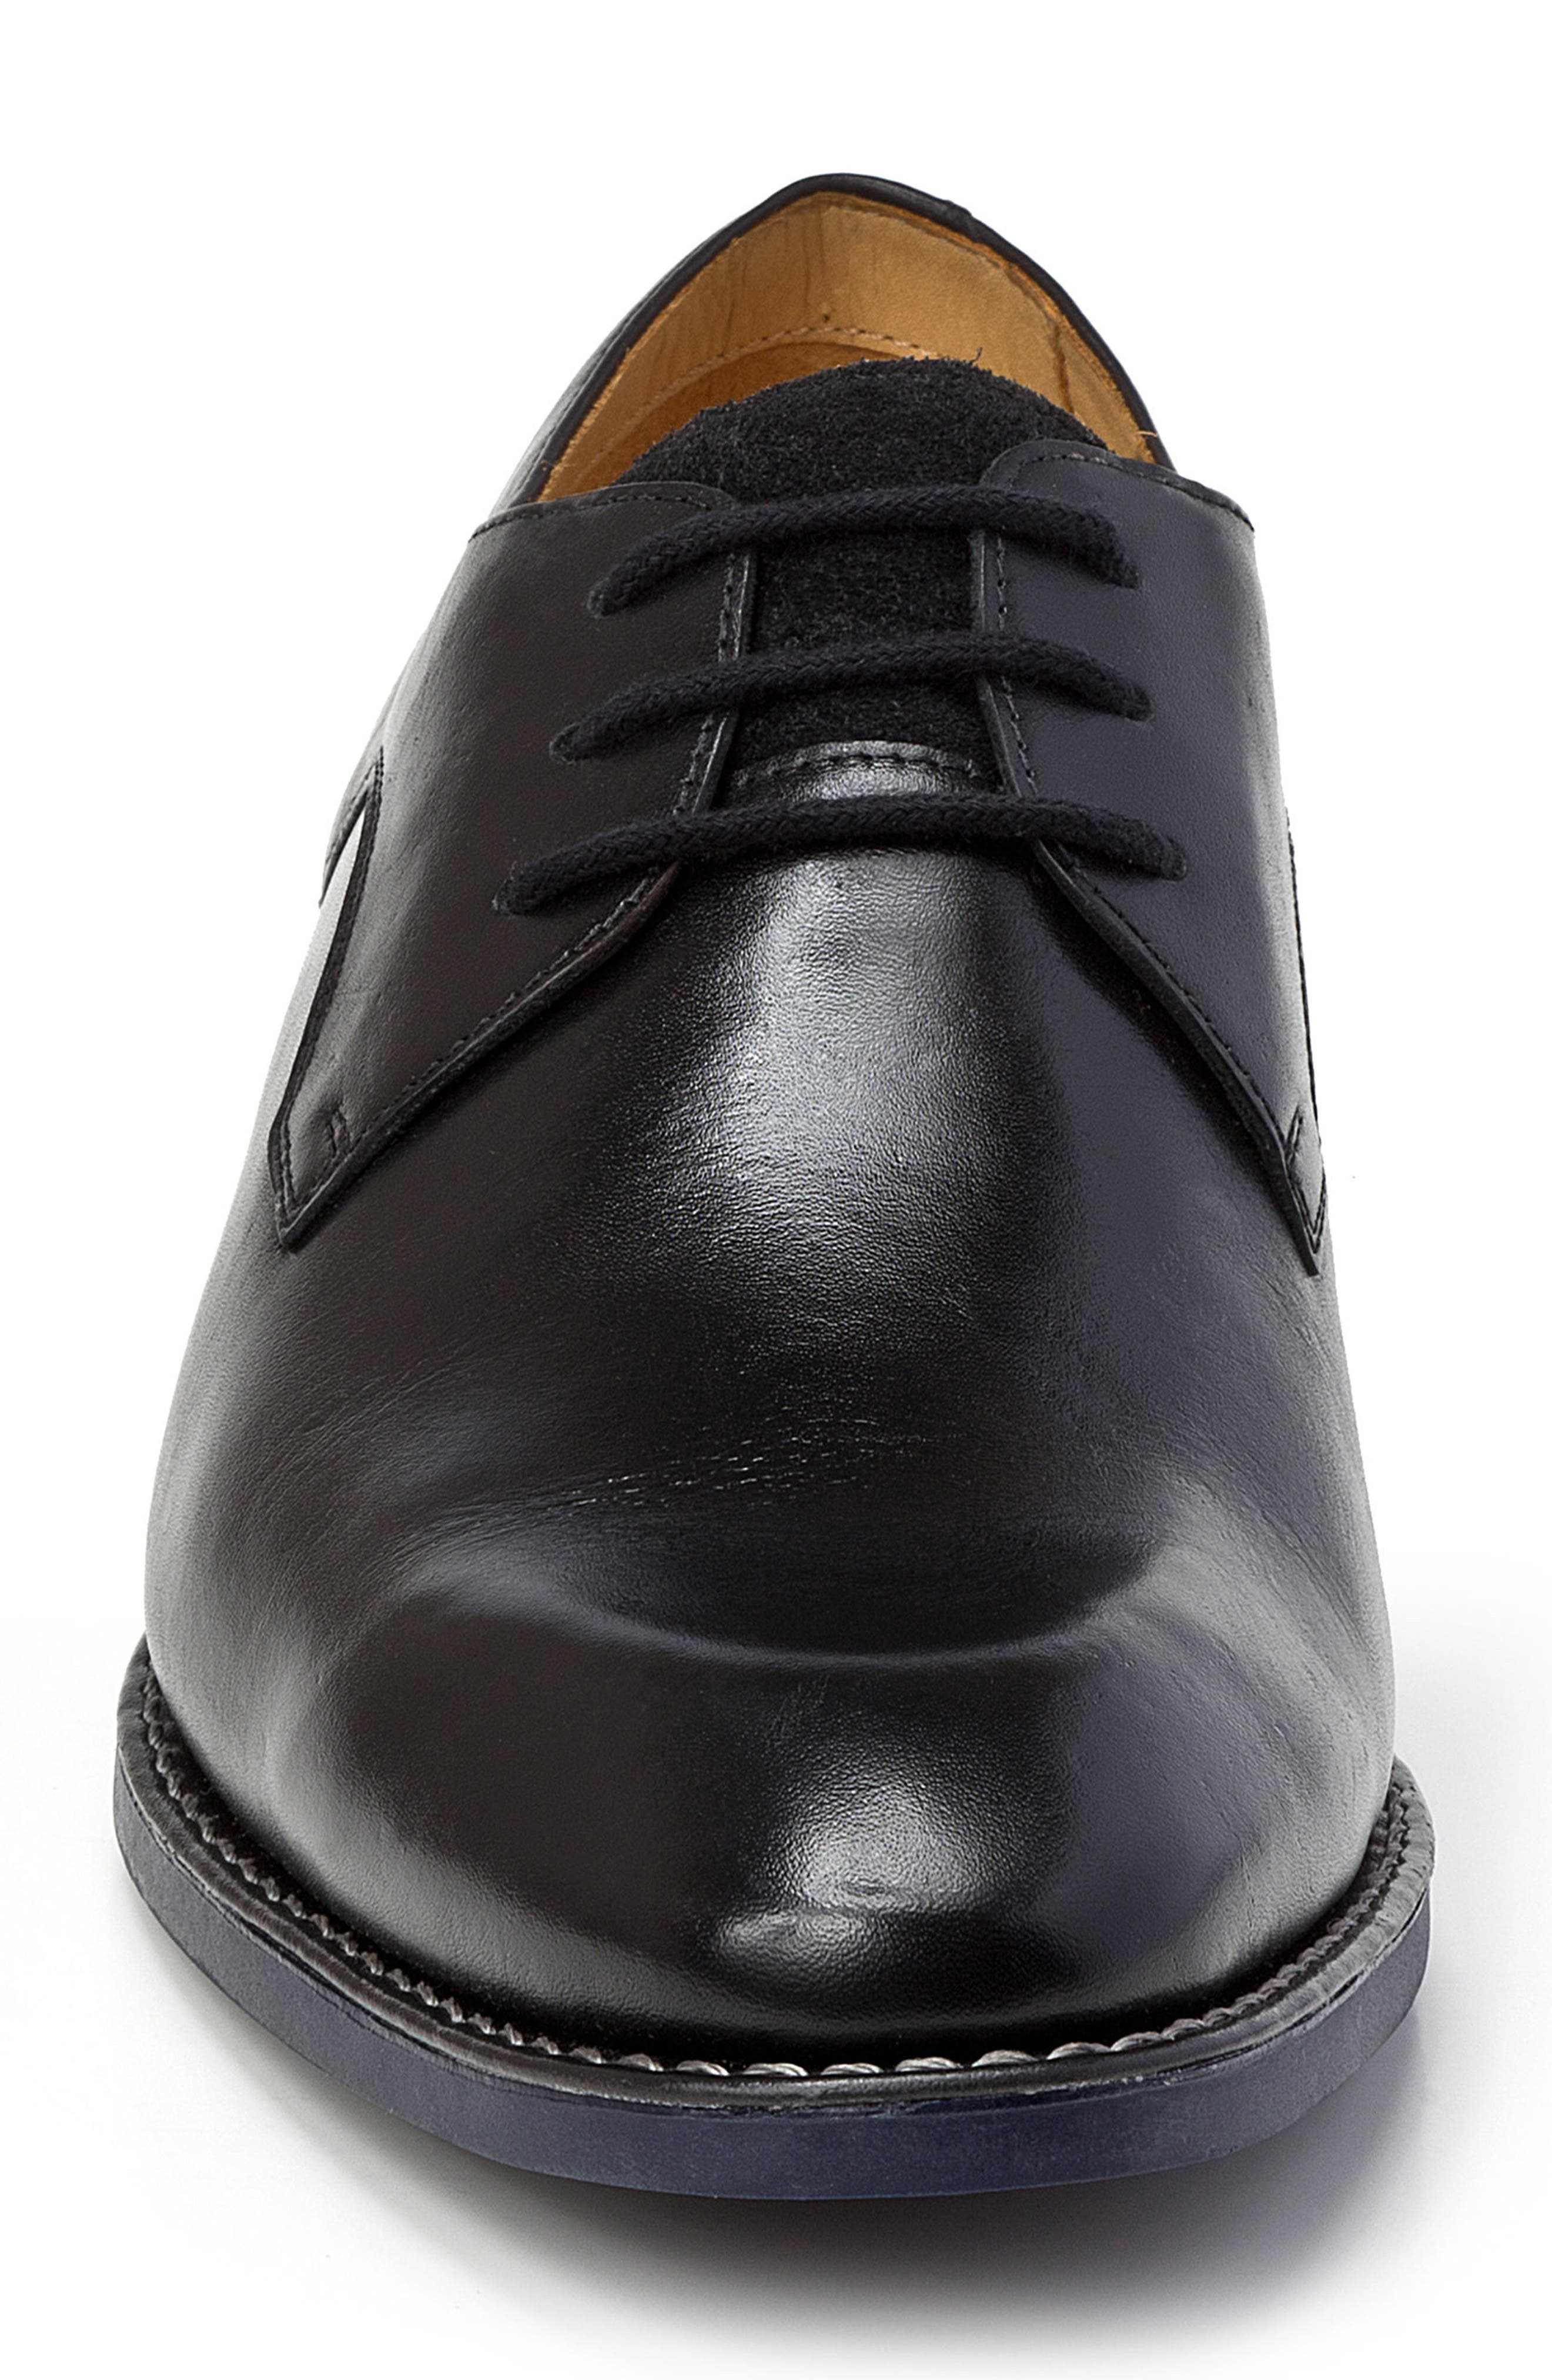 Garret Plain Toe Derby,                             Alternate thumbnail 4, color,                             BLACK LEATHER